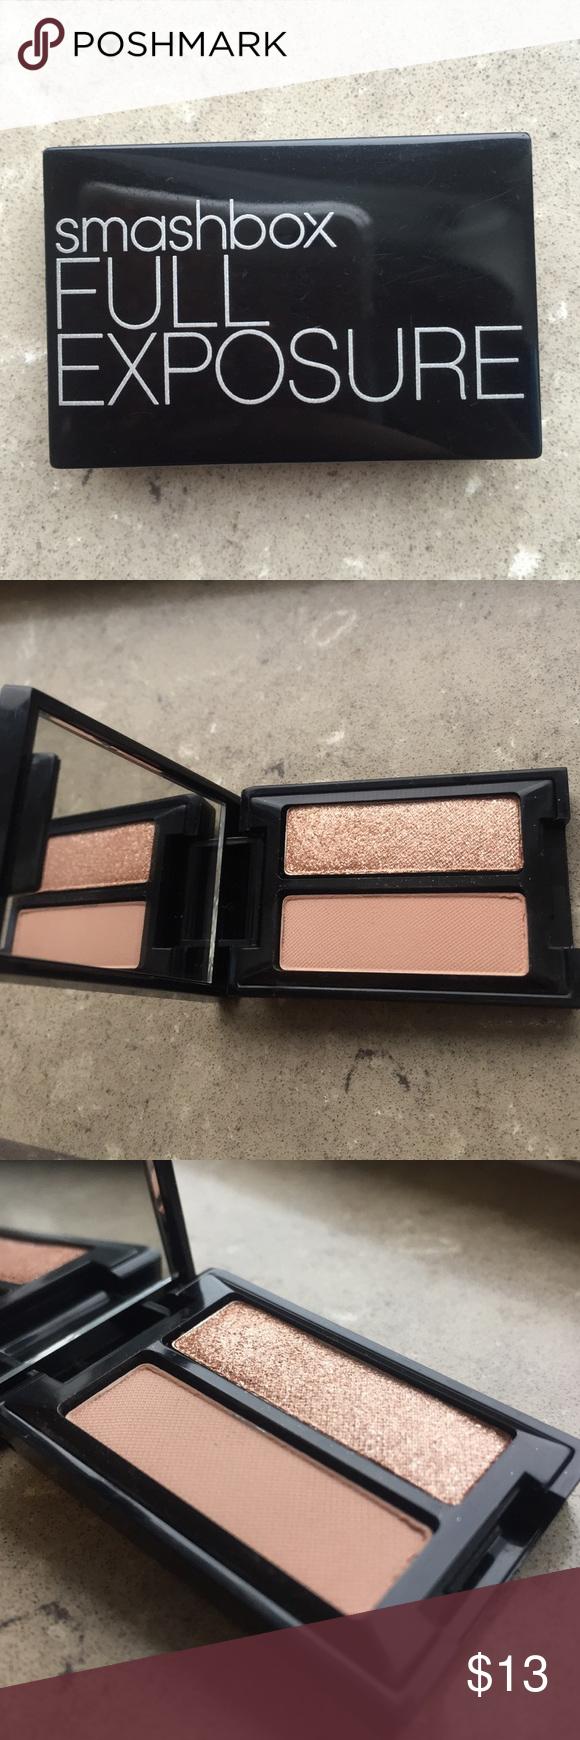 ✨Brand New Smashbox Full Exposure Eye Shadows! New Smashbox Full Exposure eyeshadow palette with mirror! Smashbox Makeup Eyeshadow